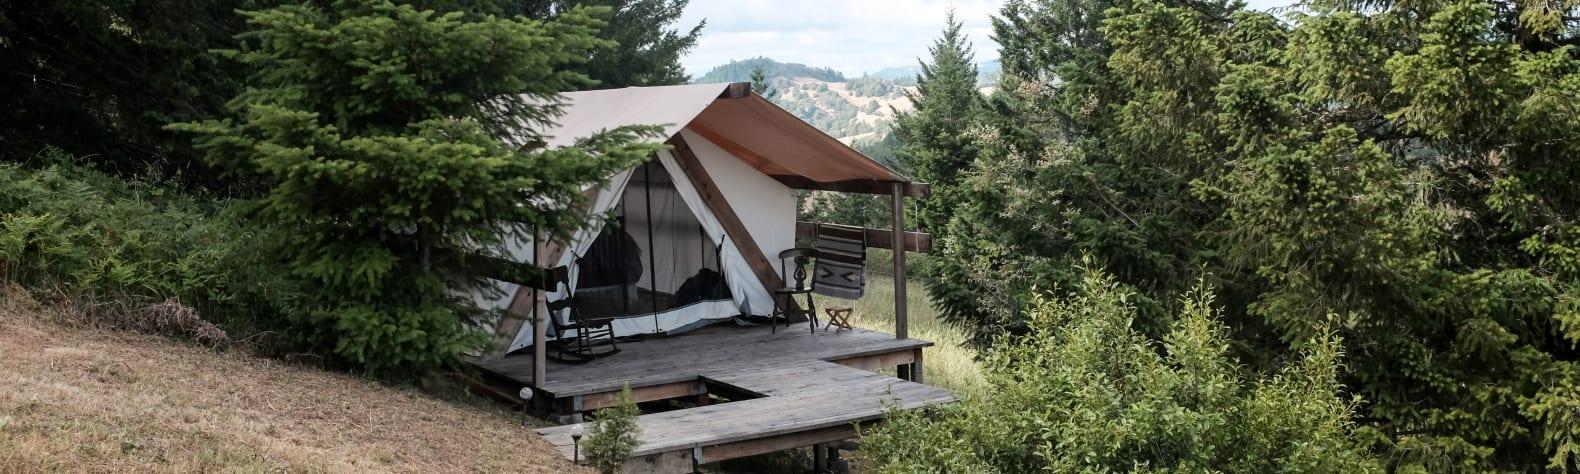 Brilliant Running Springs Ranch Camping Machost Co Dining Chair Design Ideas Machostcouk